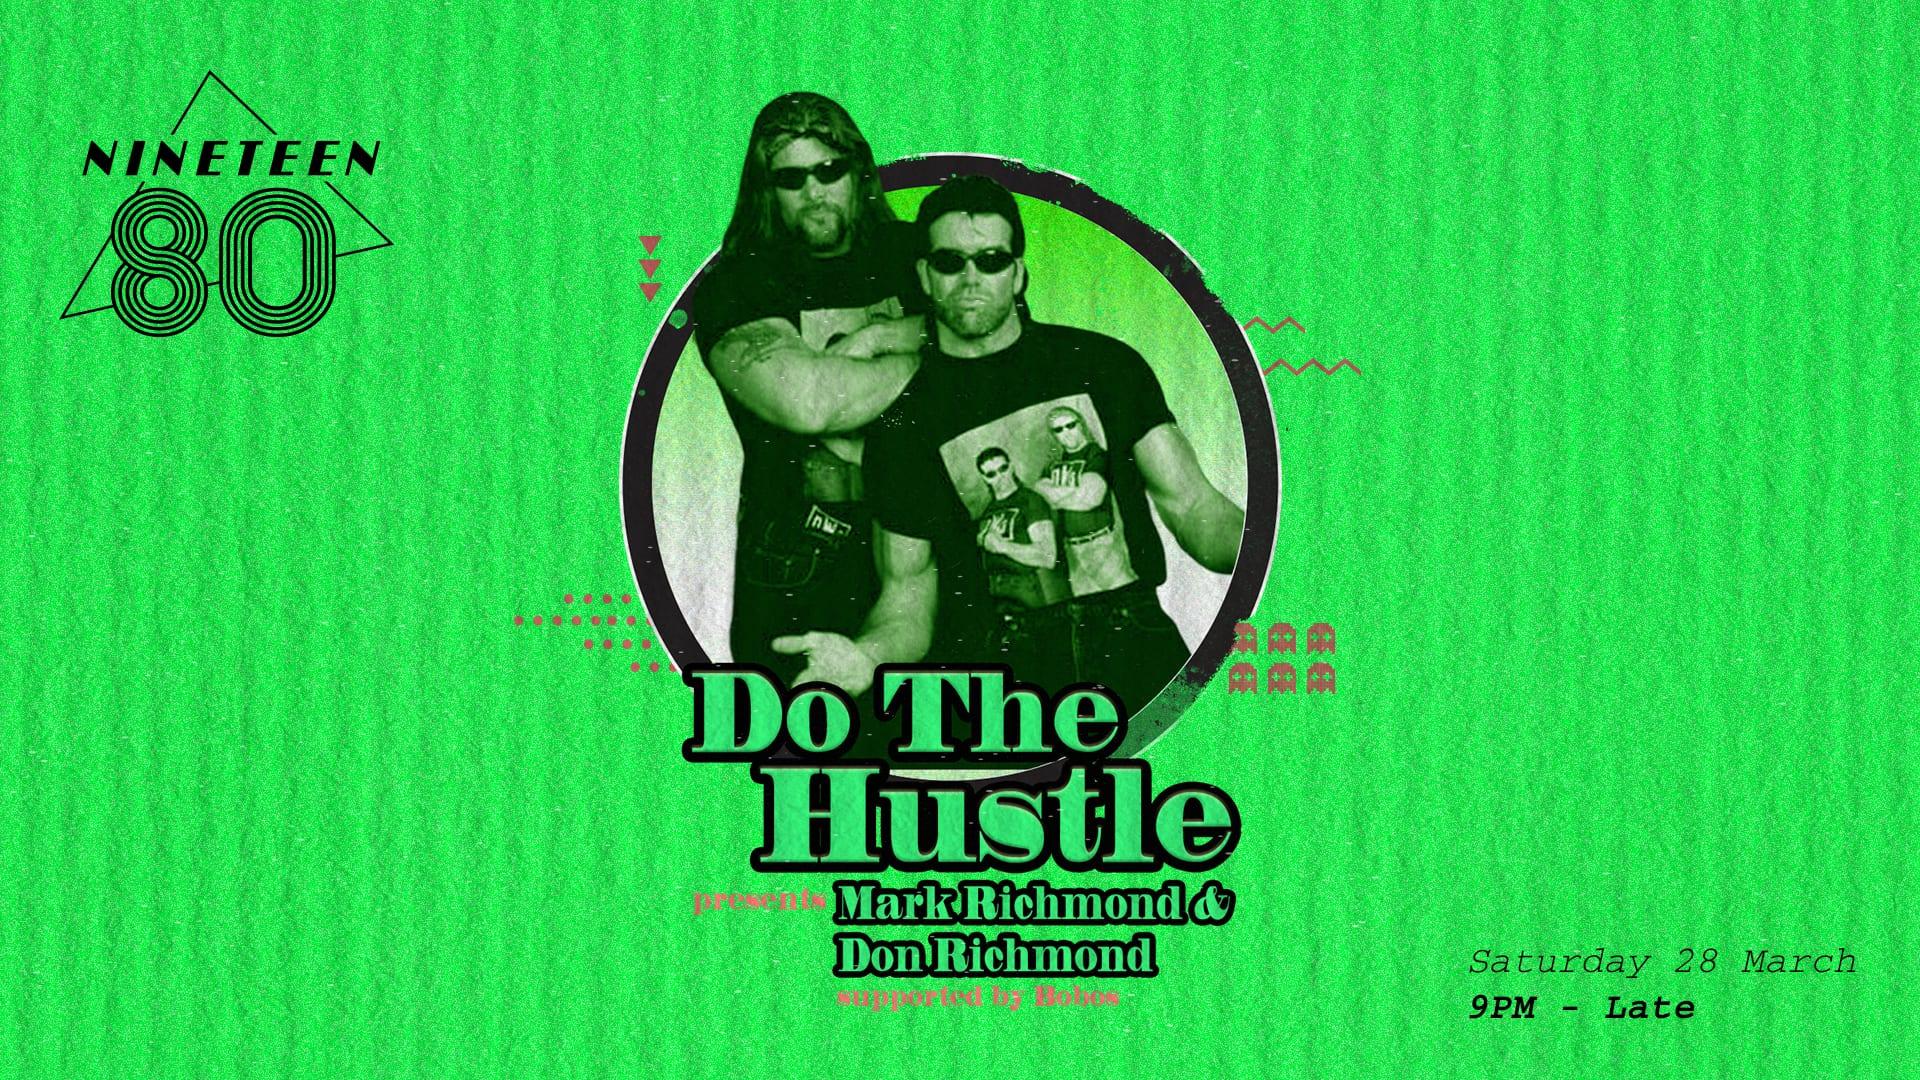 Do The Hustle presents Mark Richmond & Don Richmond